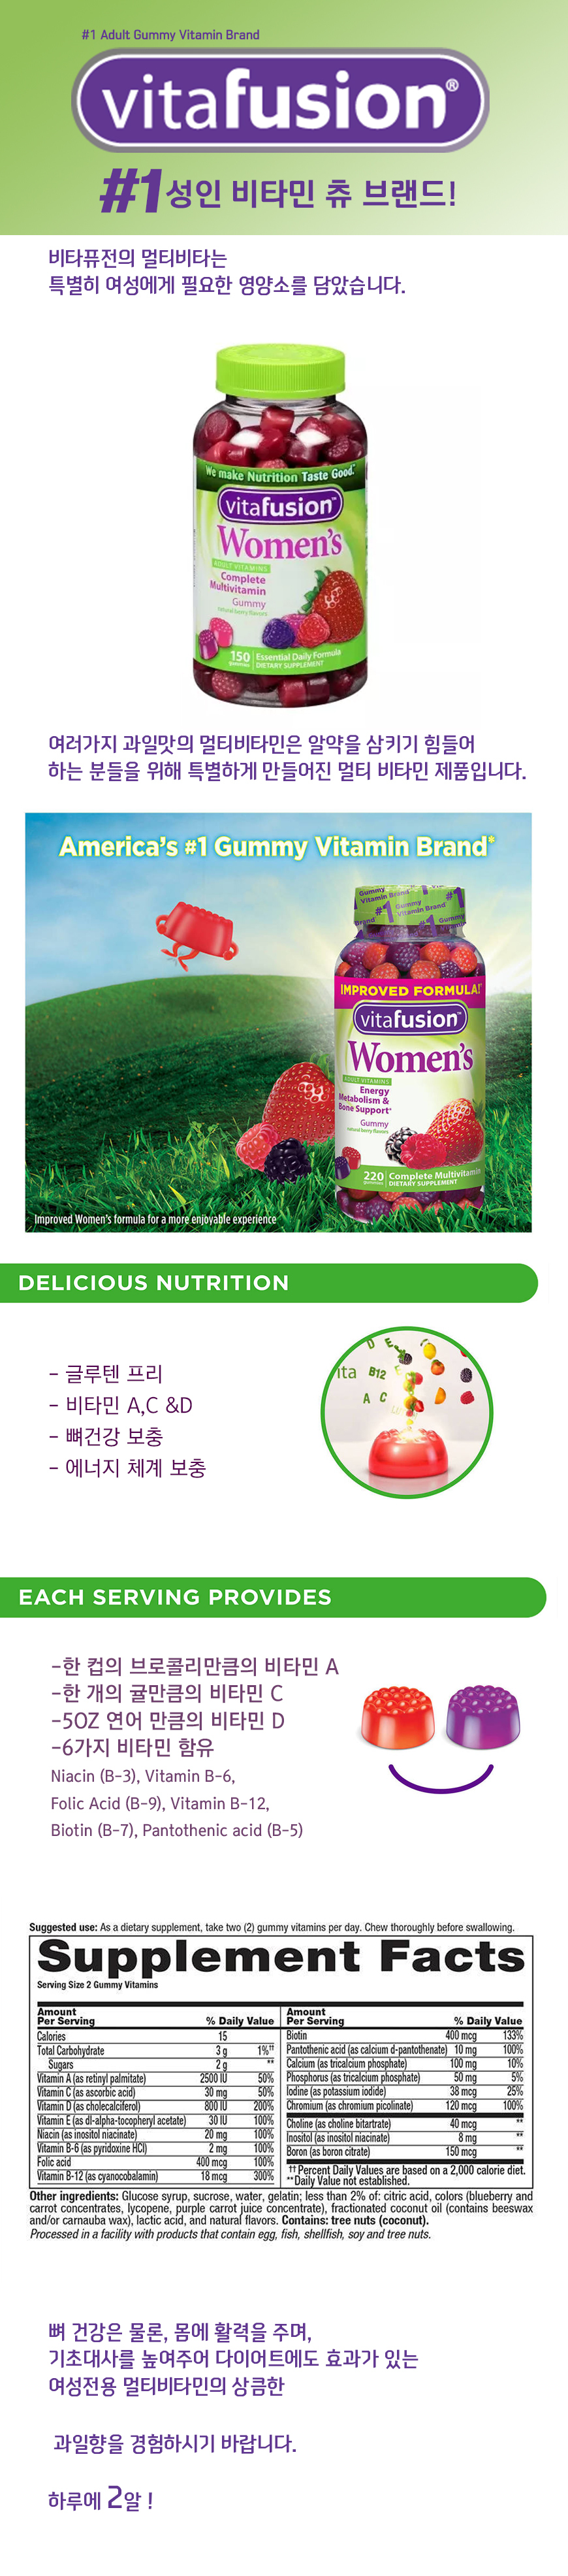 Vitafusion_women_multi.jpg